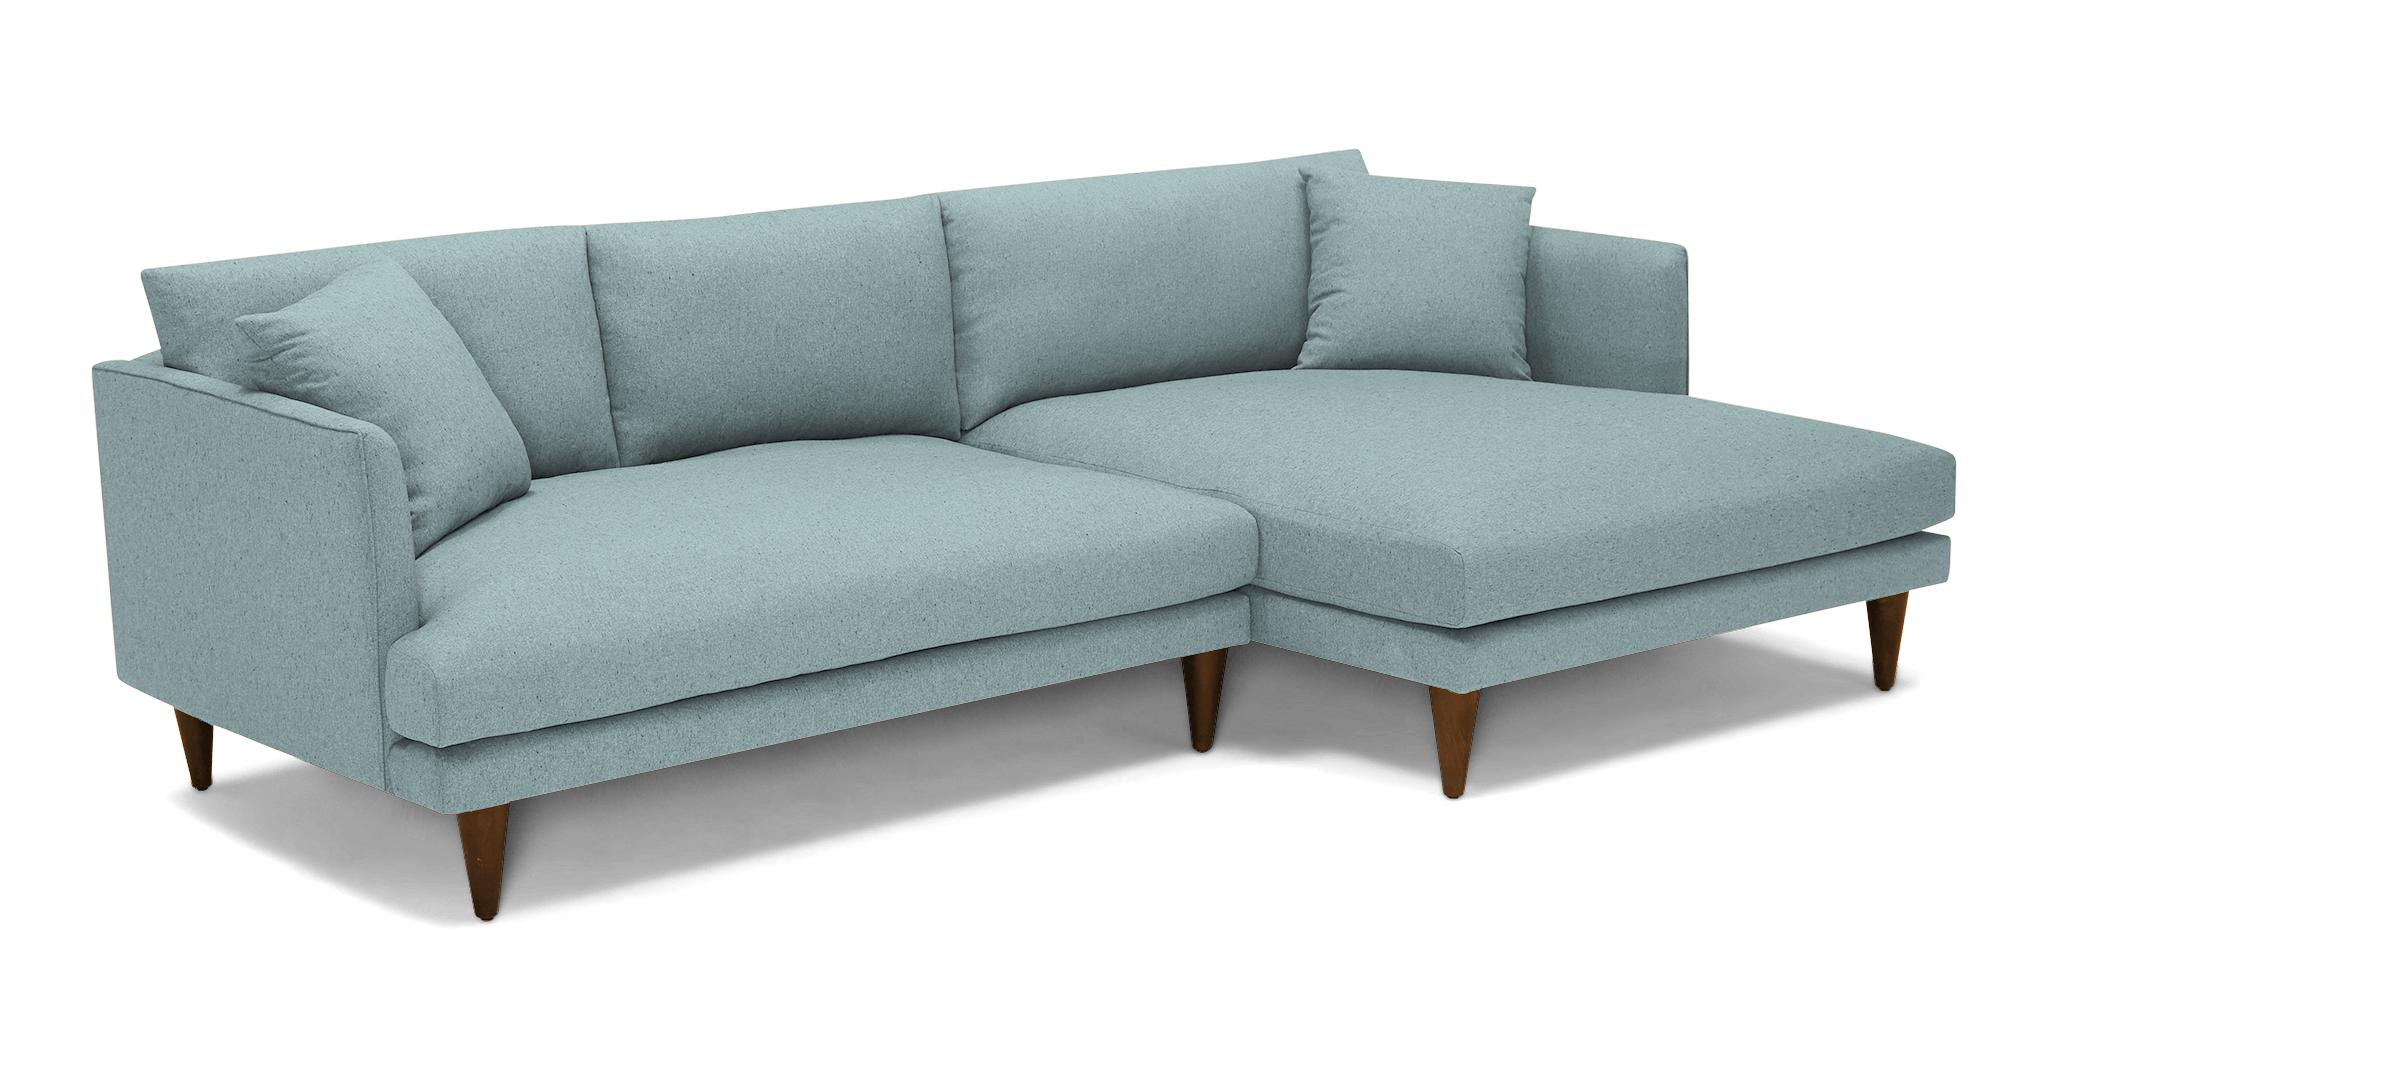 Blue Lewis Mid Century Modern Sectional - Dawson Slate - Mocha - Right - Cone